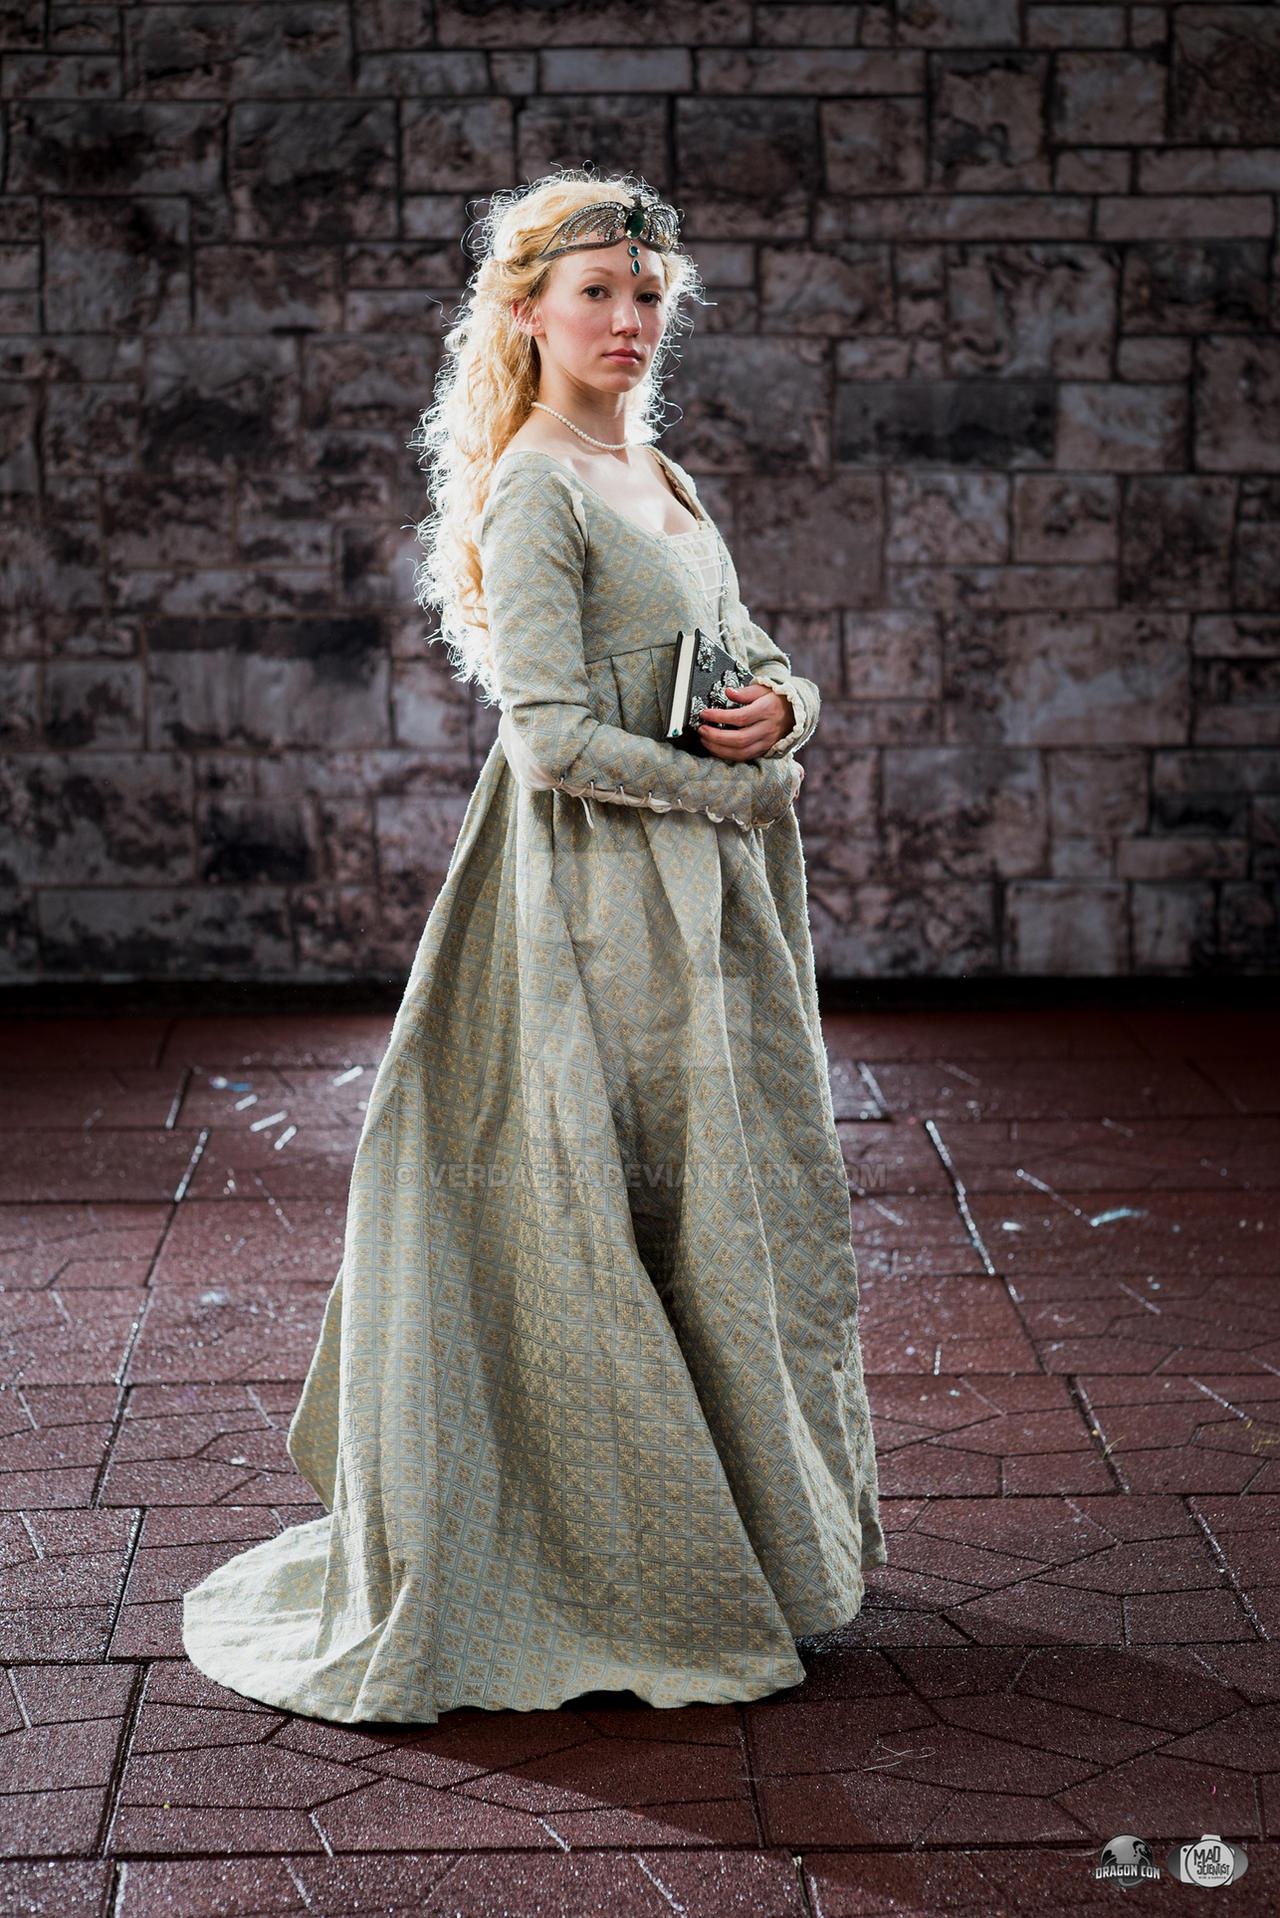 Rowena Ravenclaw by Verdaera